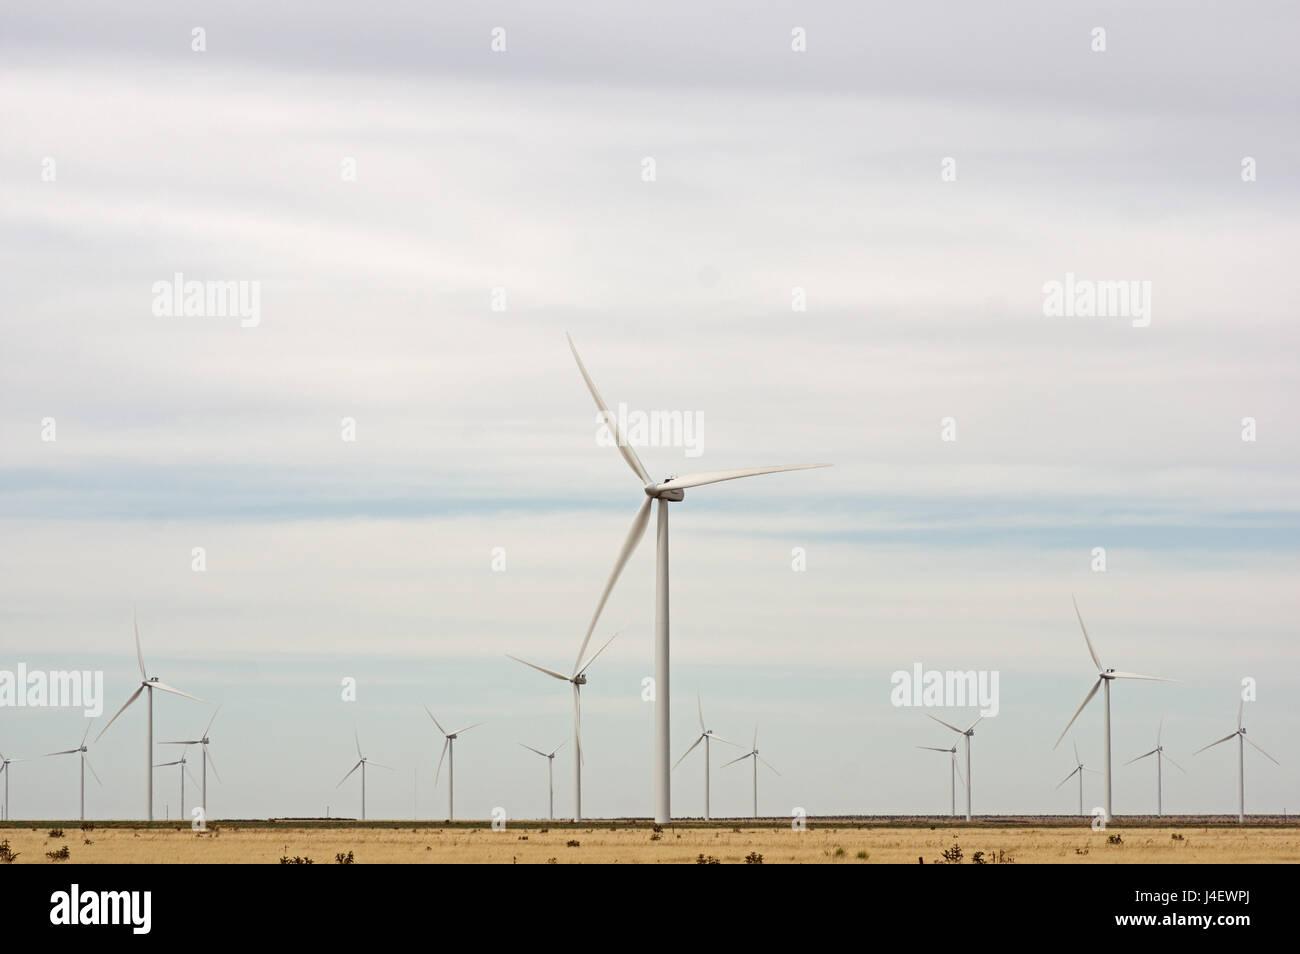 Un campo de Texas oeste de turbinas eólicas proporcionan energía renovable Imagen De Stock